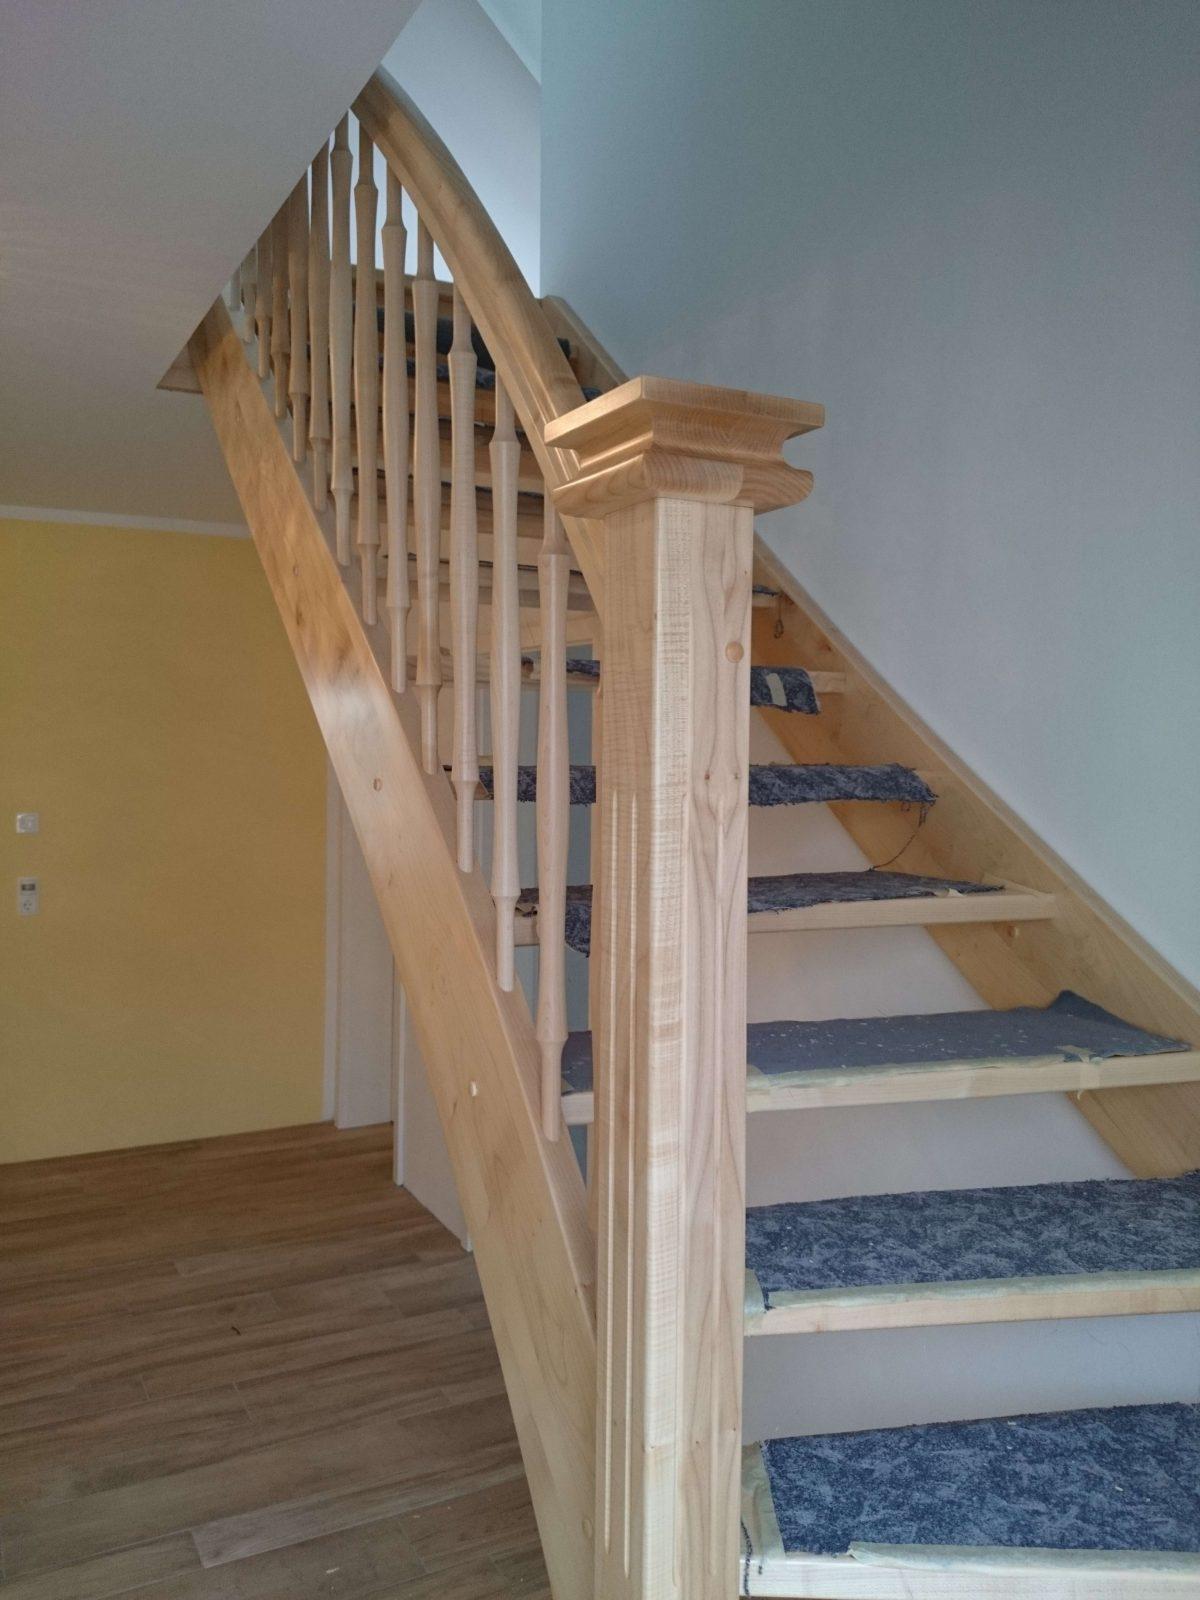 Holztreppe 1 4 Gewendelt Beautiful Treppe Nach Ma Gewendelt Rechts von Treppe 1 4 Gewendelt Rechts Photo